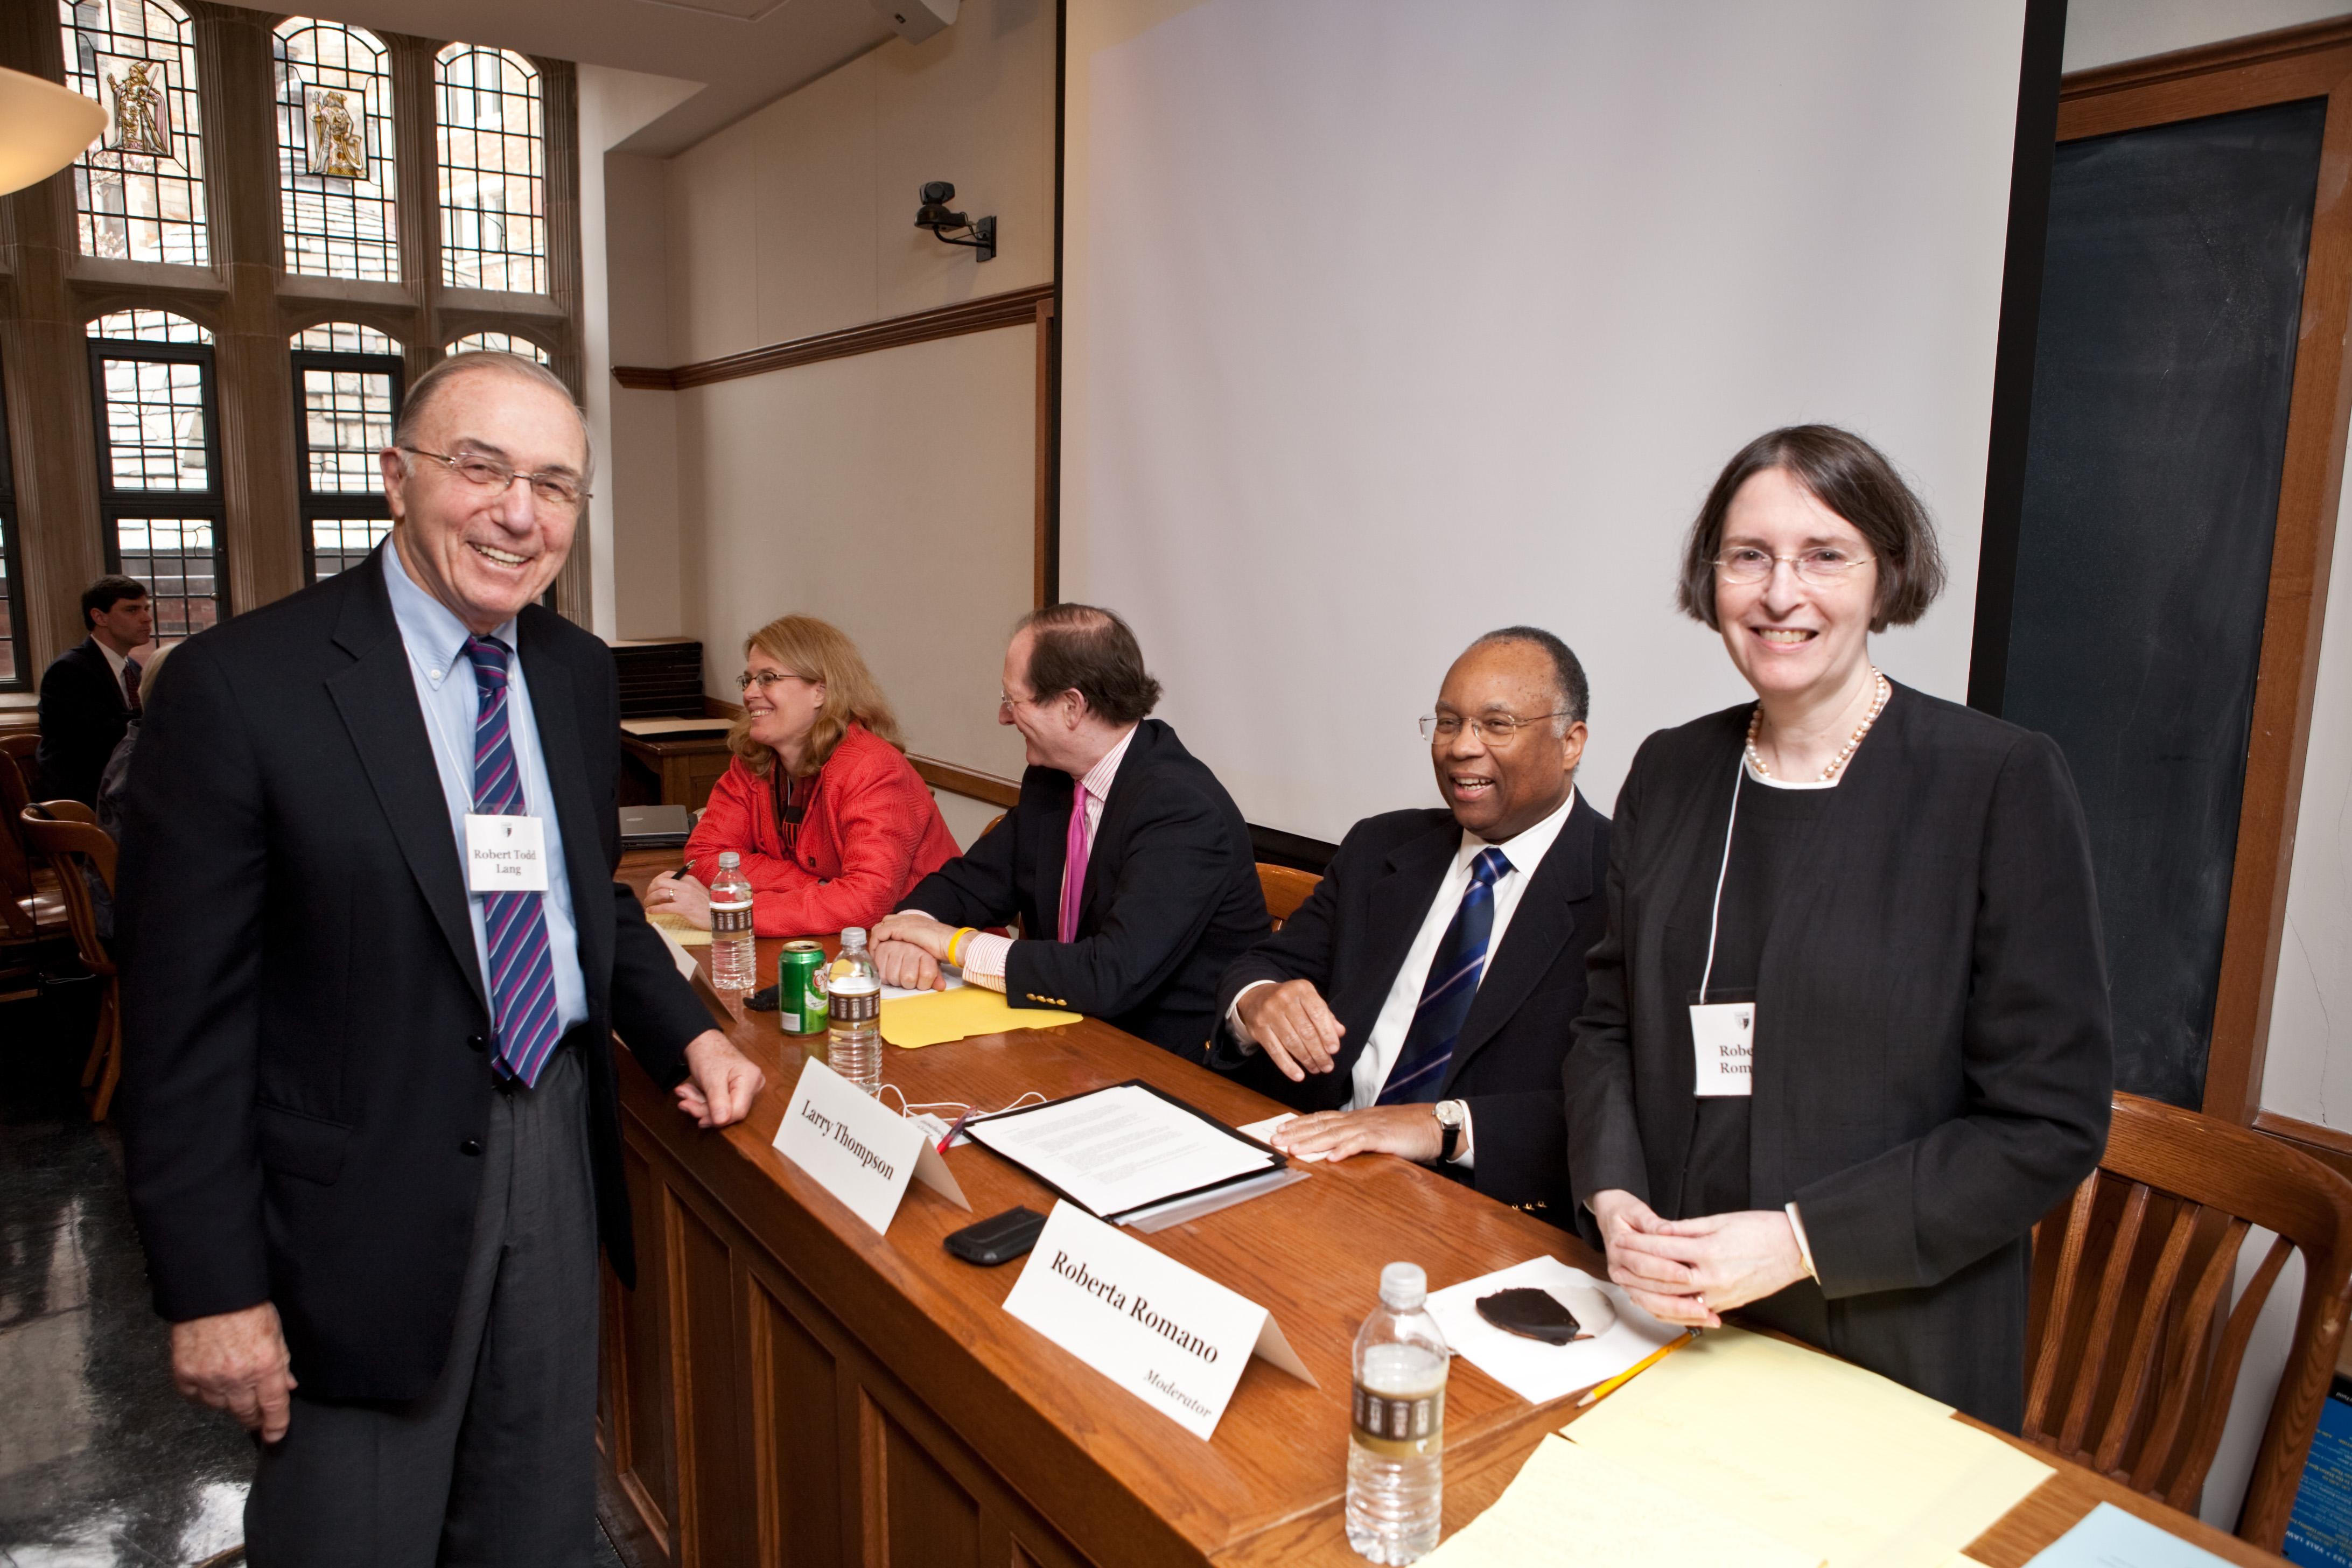 Robert Todd Lang '47, NYU Law Prof. Jennifer Arlen, Ben Heineman '71, Larry Thompson, and YLS Prof. and Center Dir. Roberta Romano '80